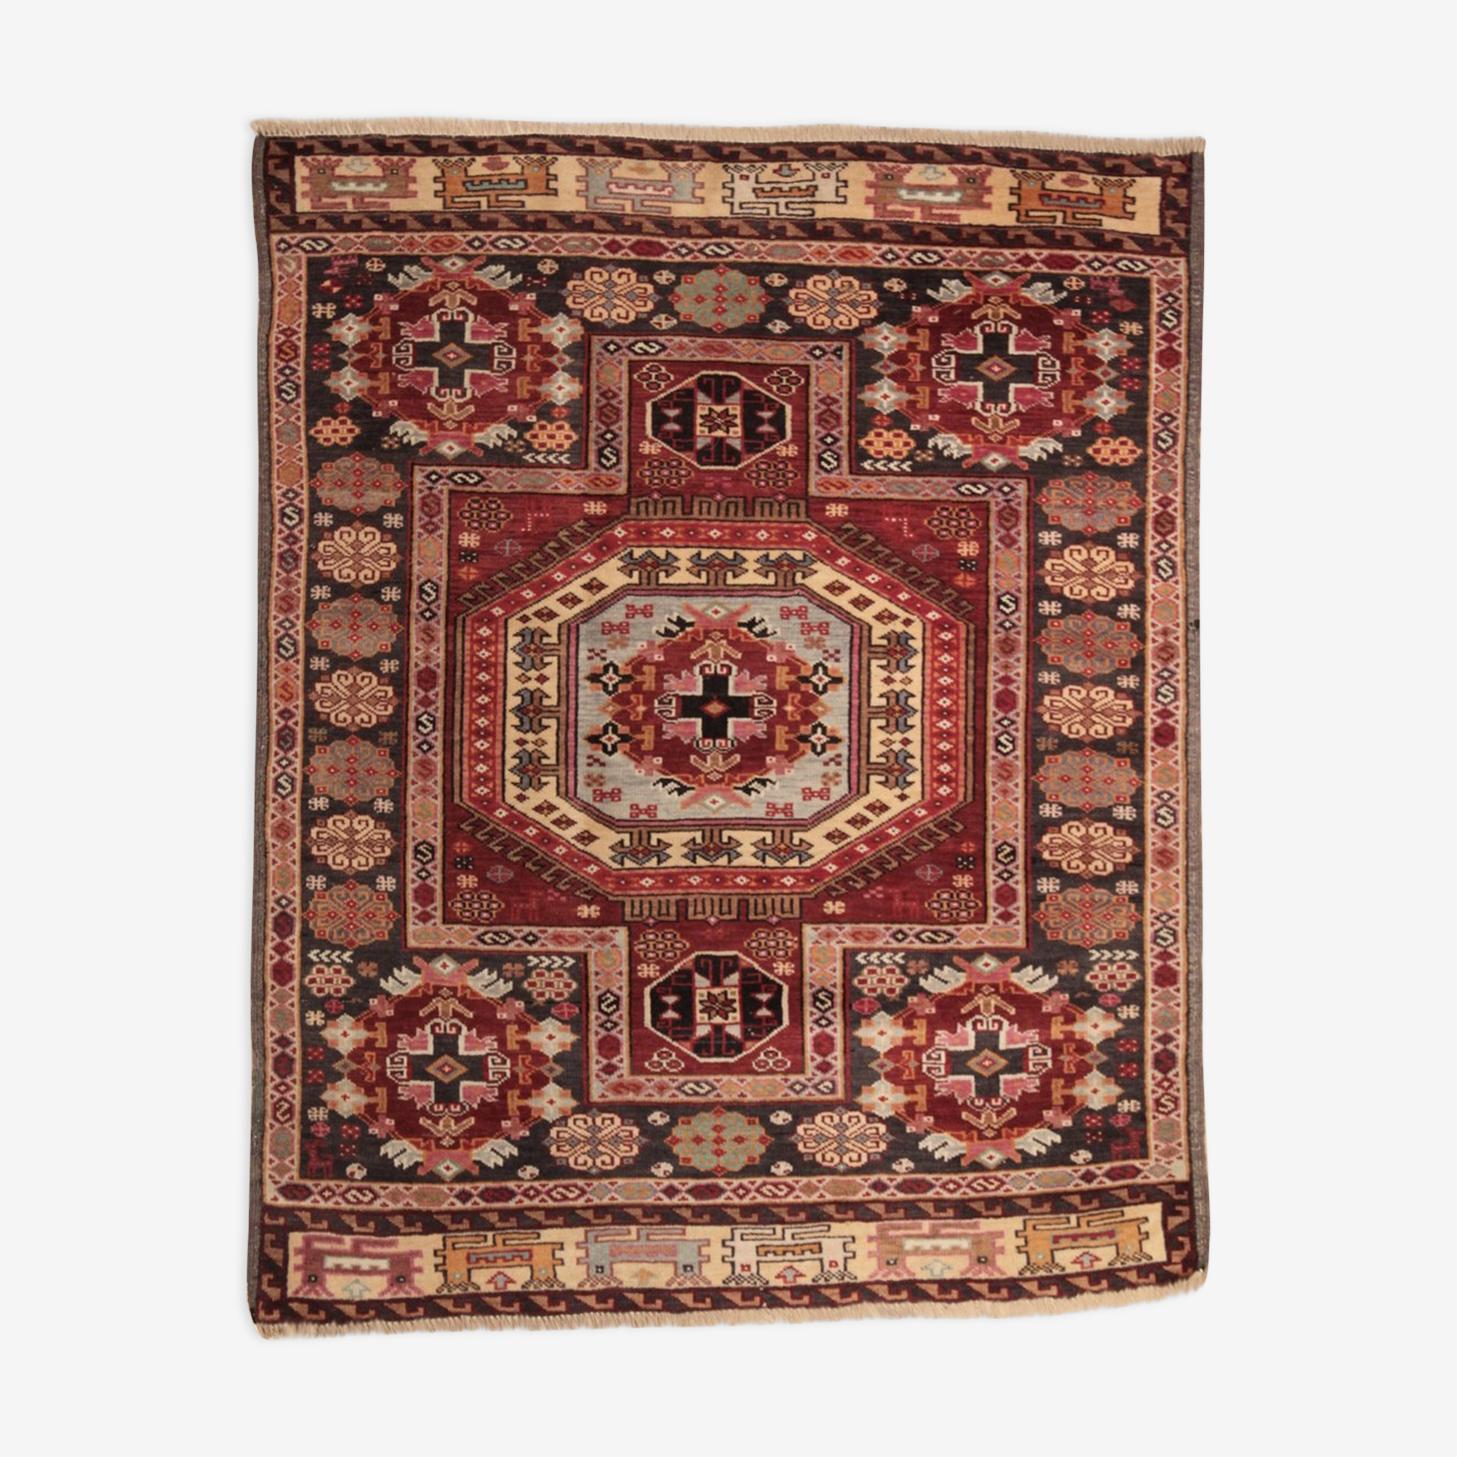 Persian rug Iranian Azerbaijan 133 x 108 cm